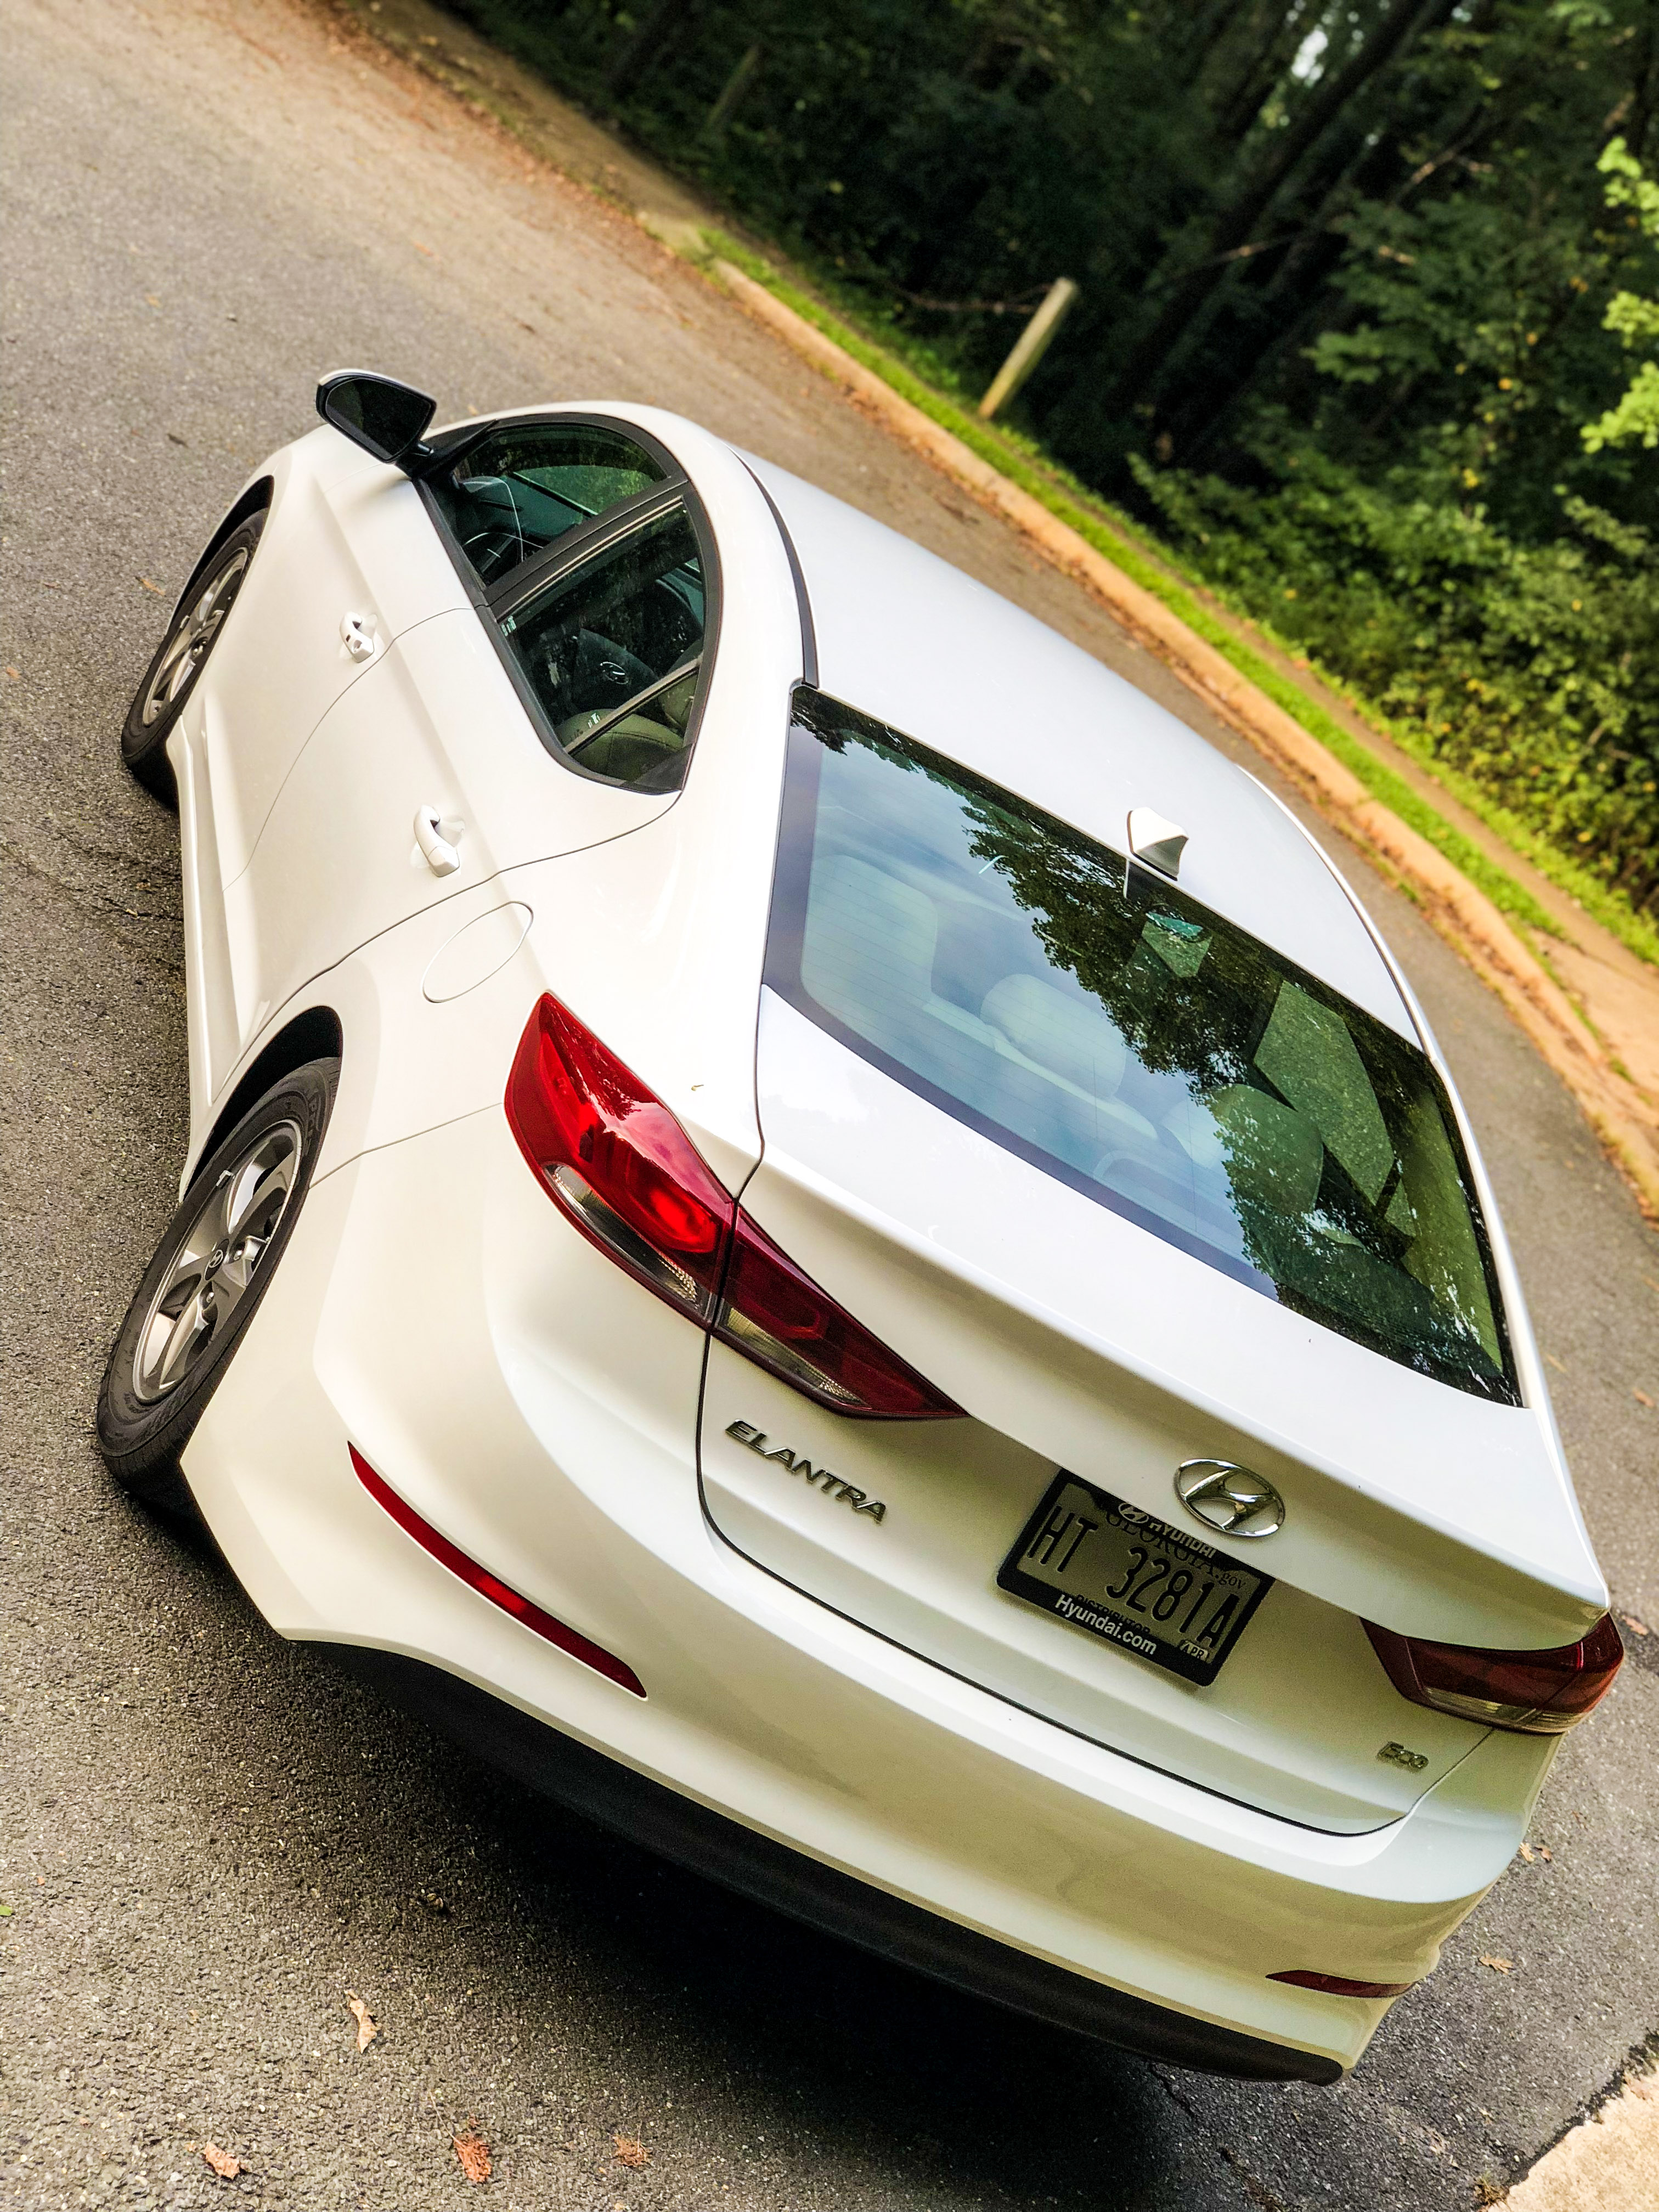 2018HyundaiElantraEco_startup via @carsfera www.carsfera.com #autonomous #cars #selfdriving #vehicles #future #futuristic #futurism #foresight #trends #ai #artificialintelligence #tech #testdrives #hyundai #hyundai2018 #hyundaielantra #hyundayelantraeco2018 #drivingthehyundaielantraeco #drivinghyundai